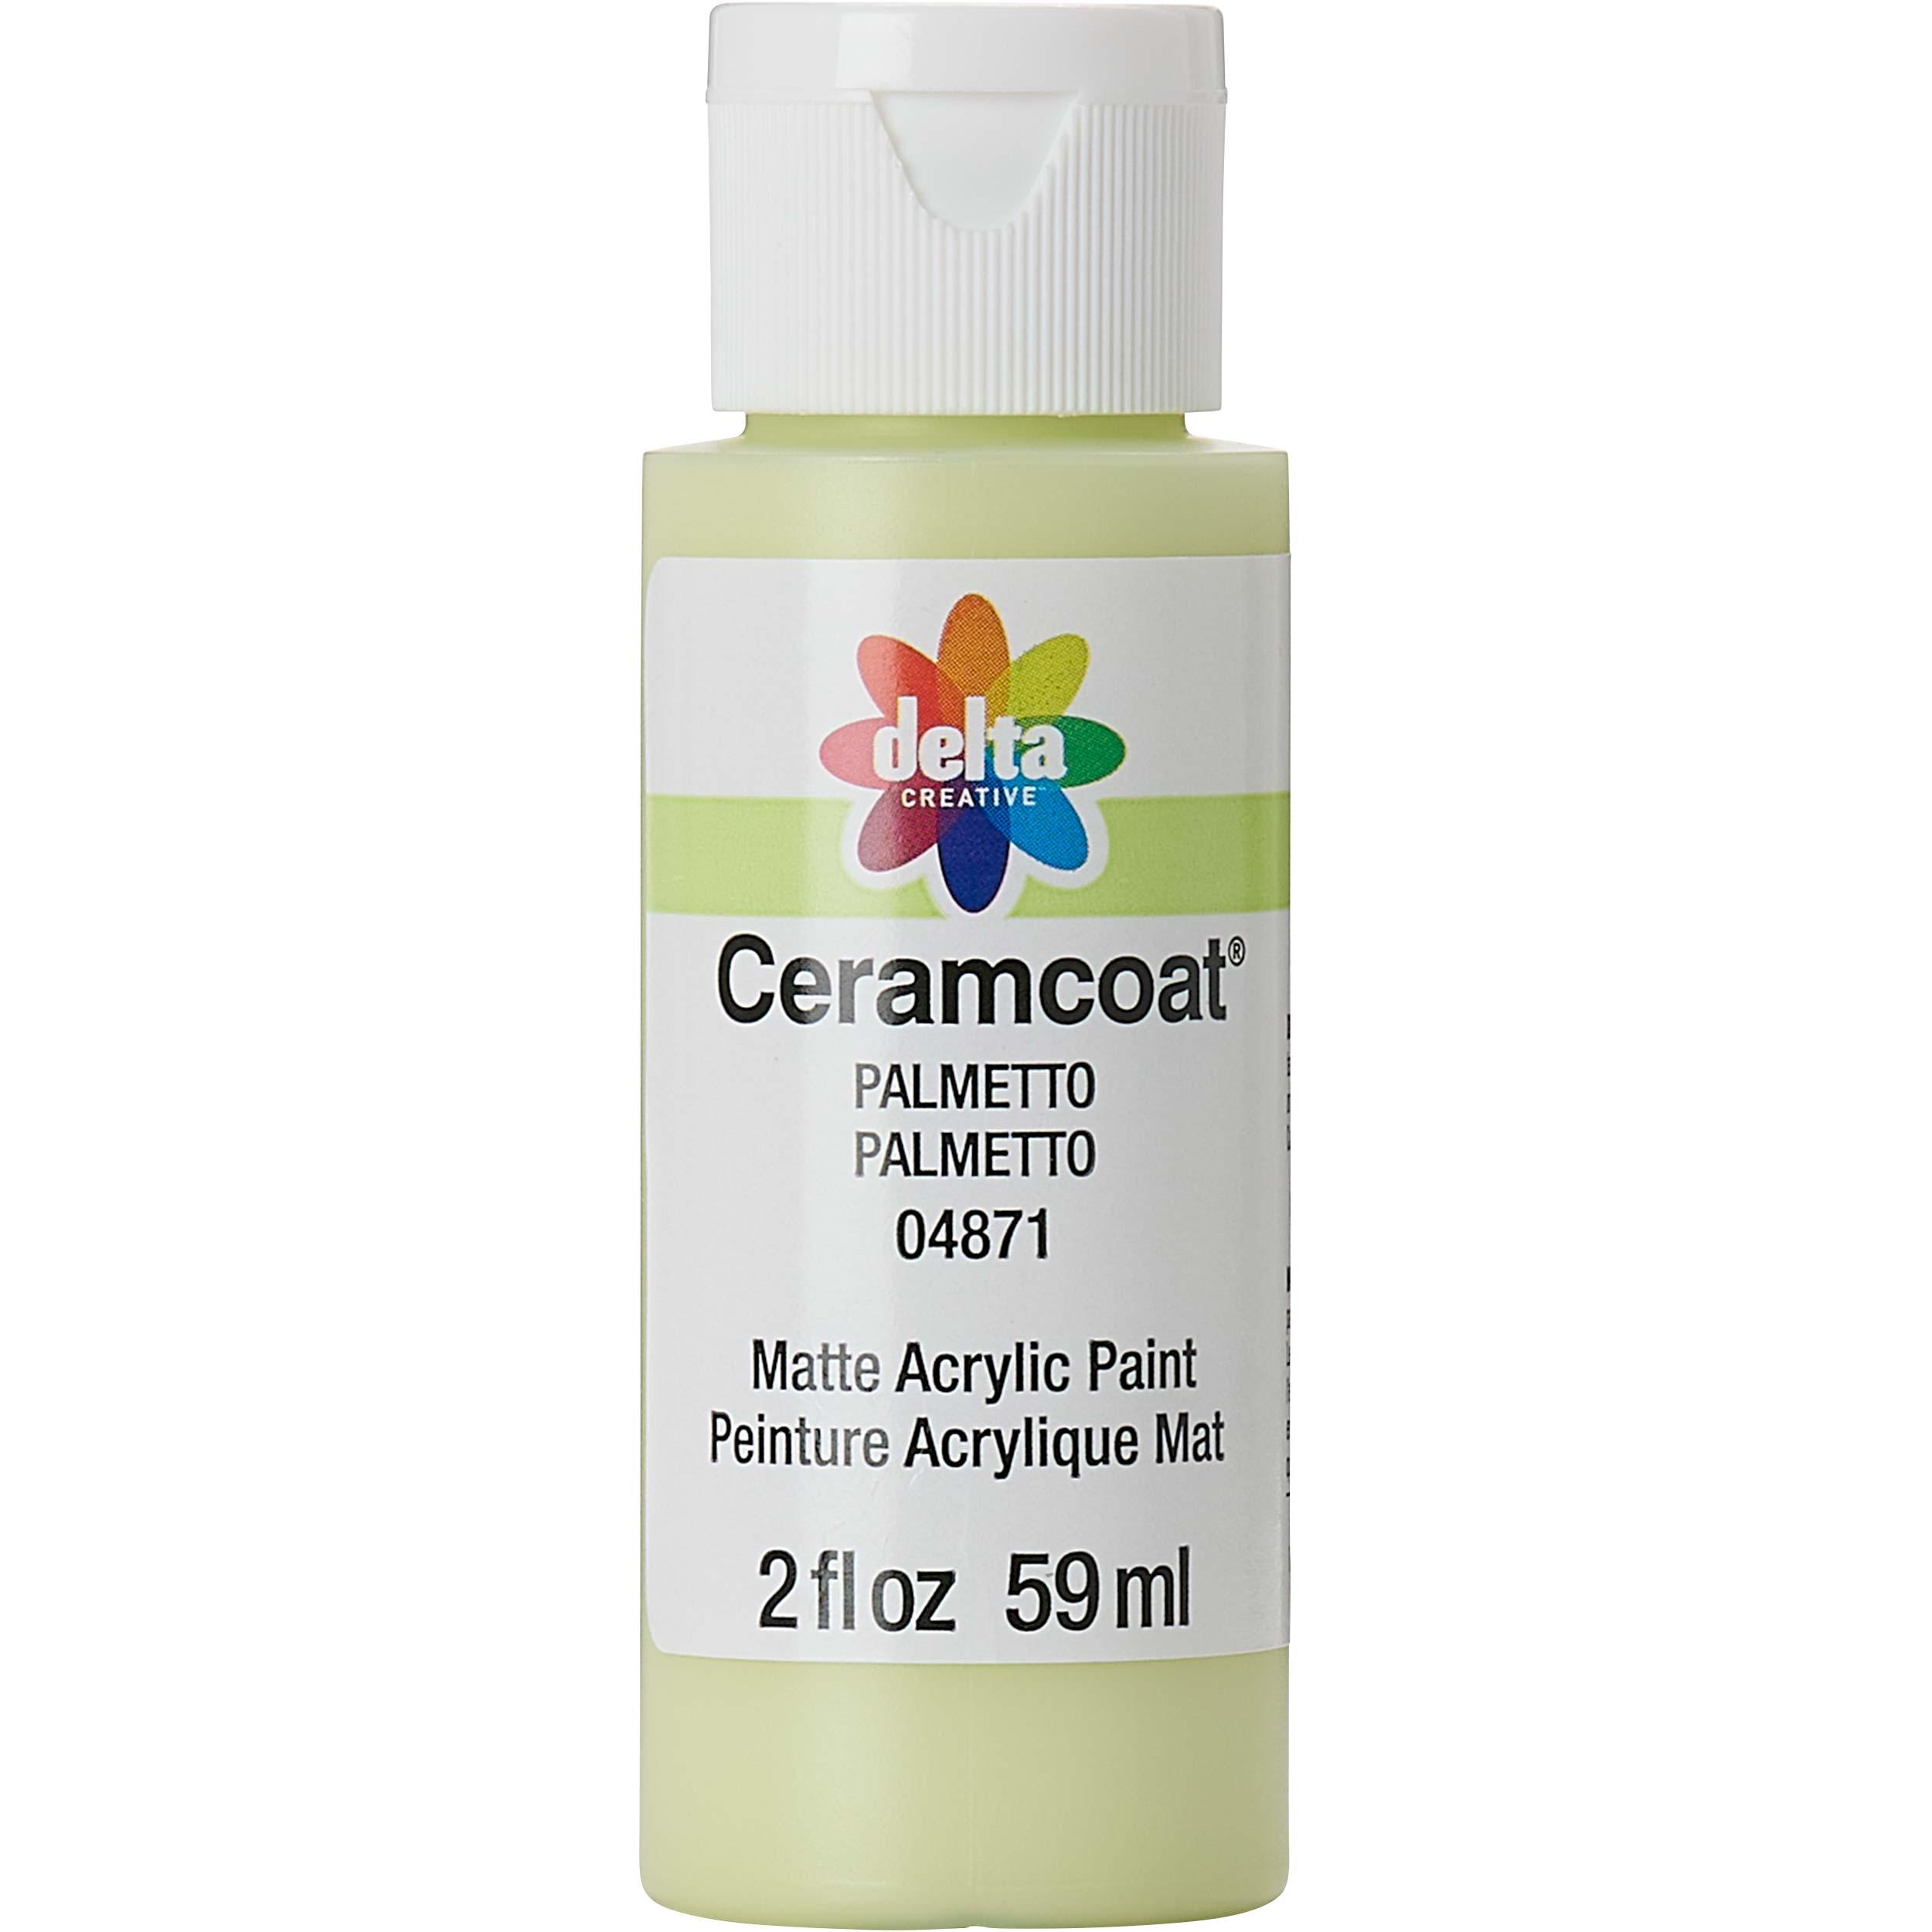 Delta Ceramcoat ® Acrylic Paint - Palmetto, 2 oz. - 04871